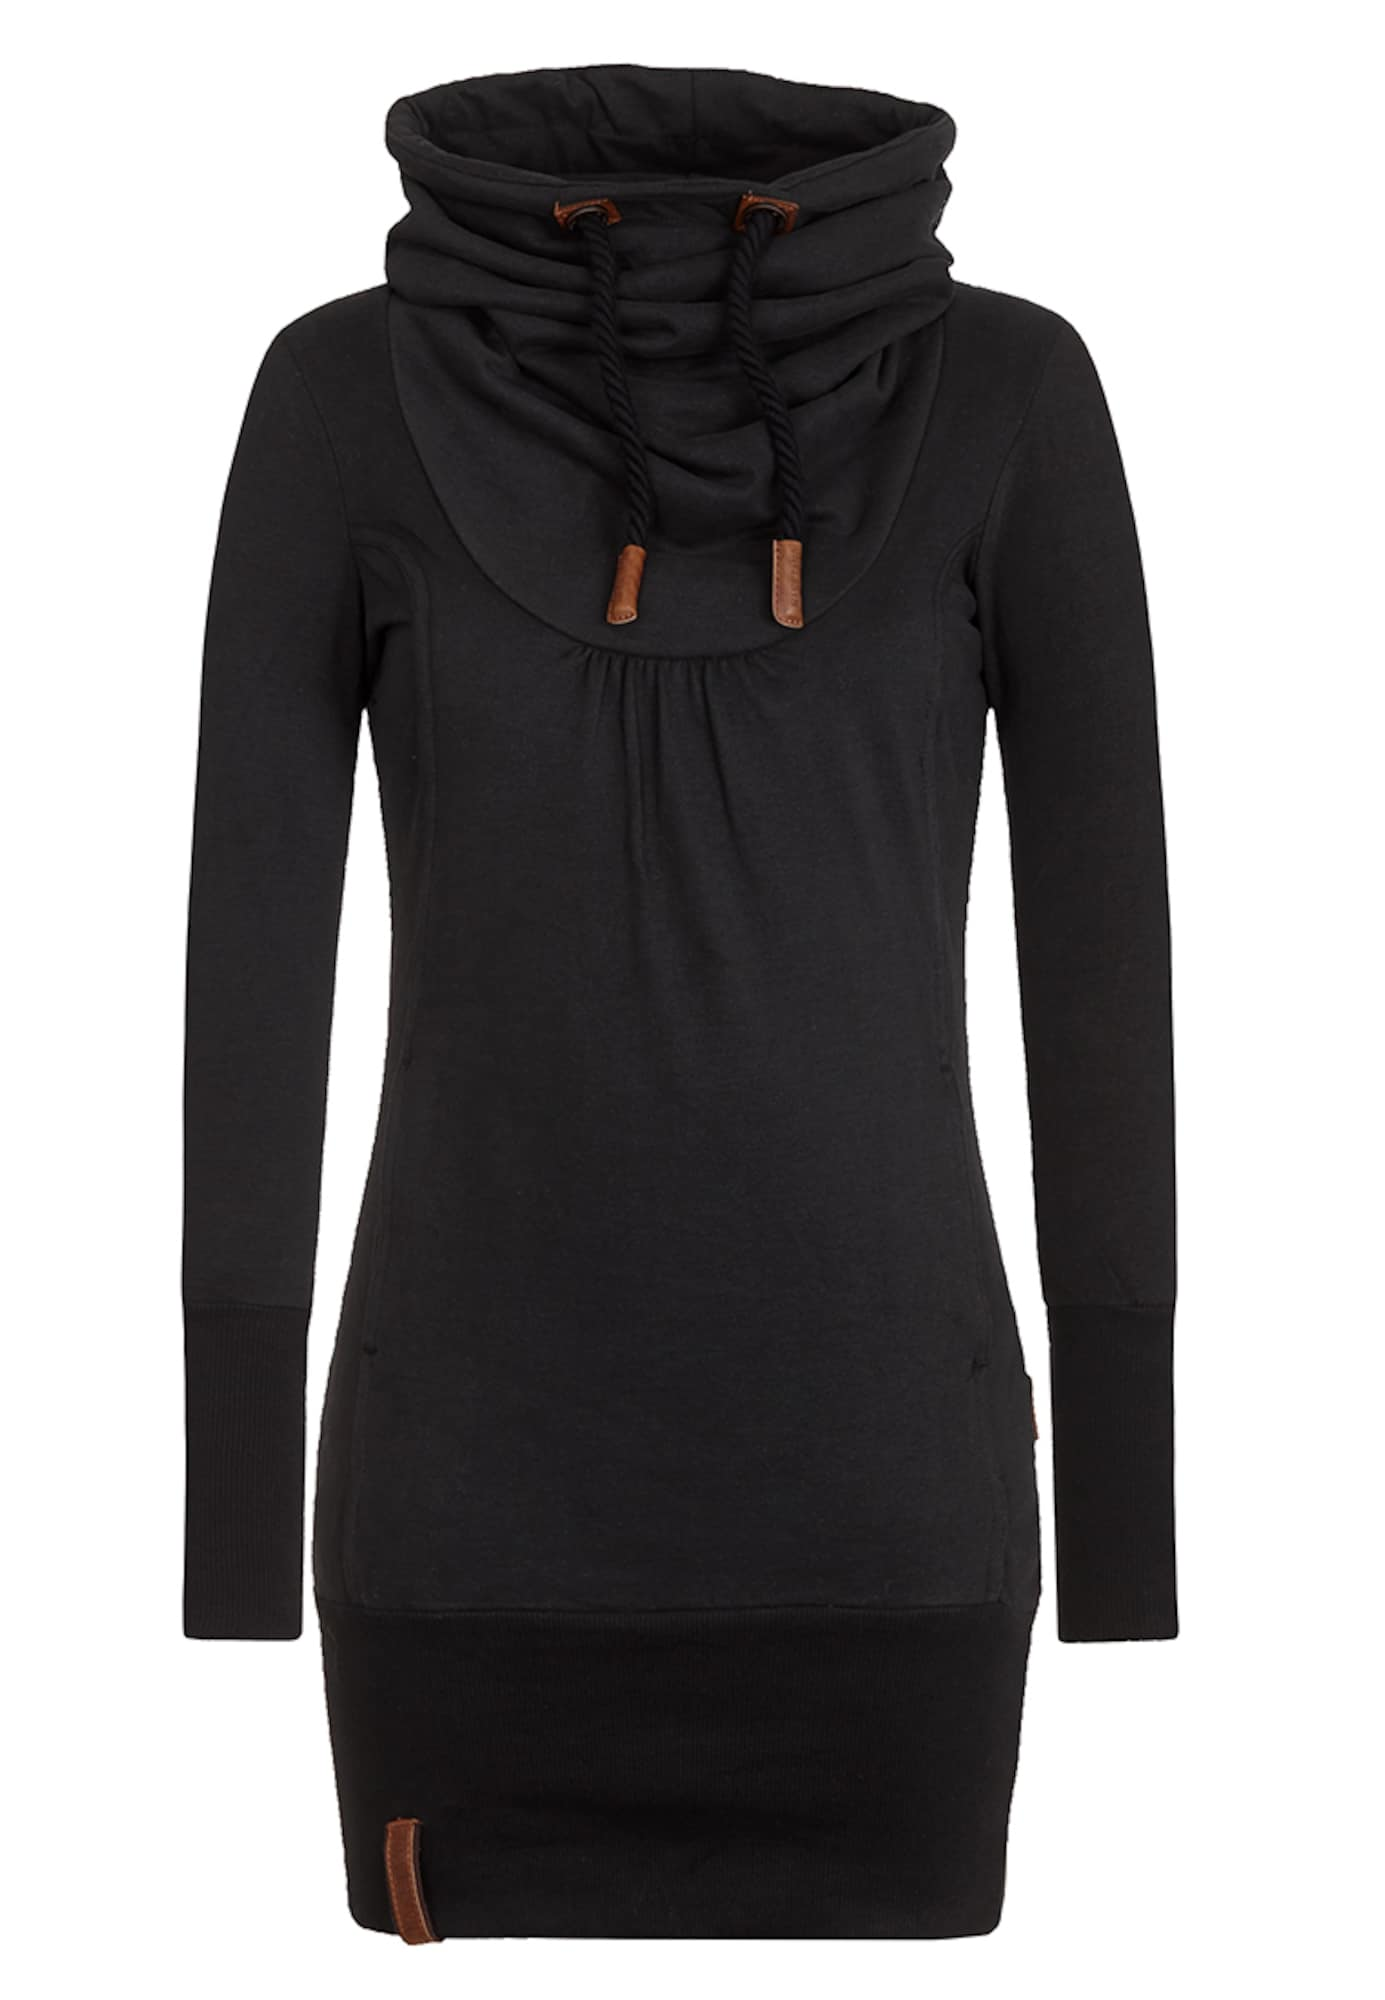 Naketano, Dames Sweatshirt, bruin / zwart